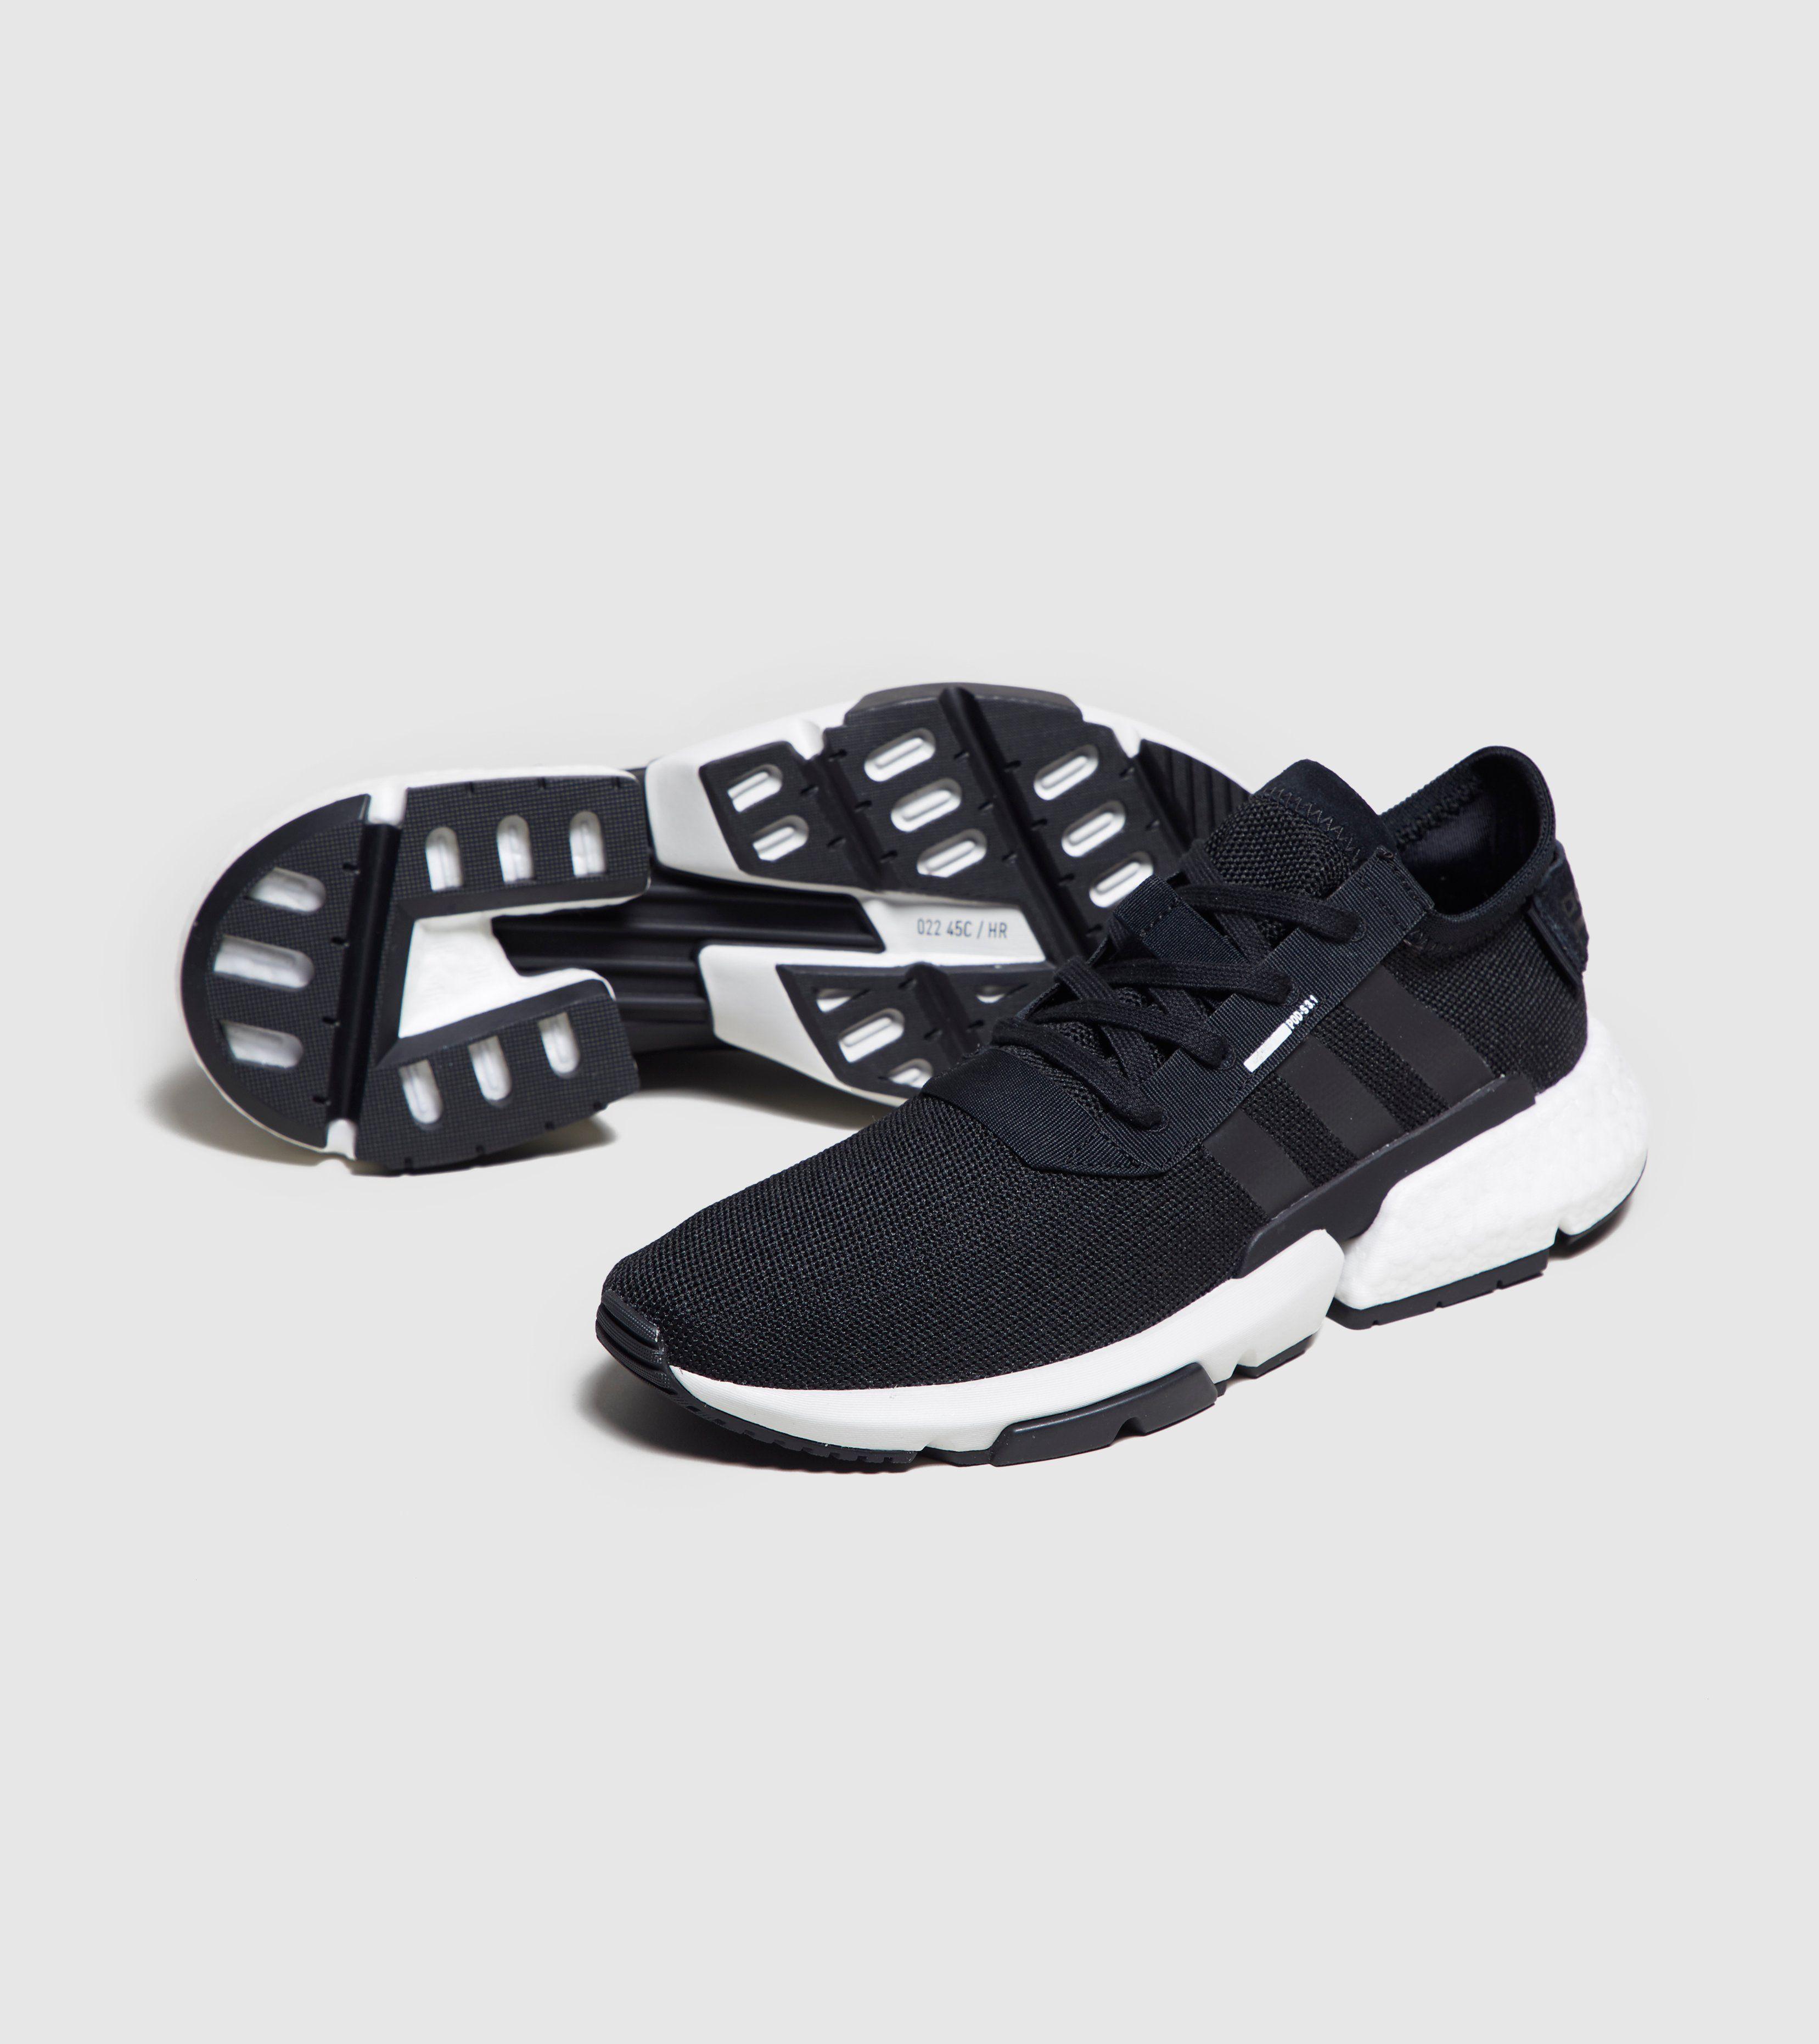 Diadora Jogging - size? Exclusive